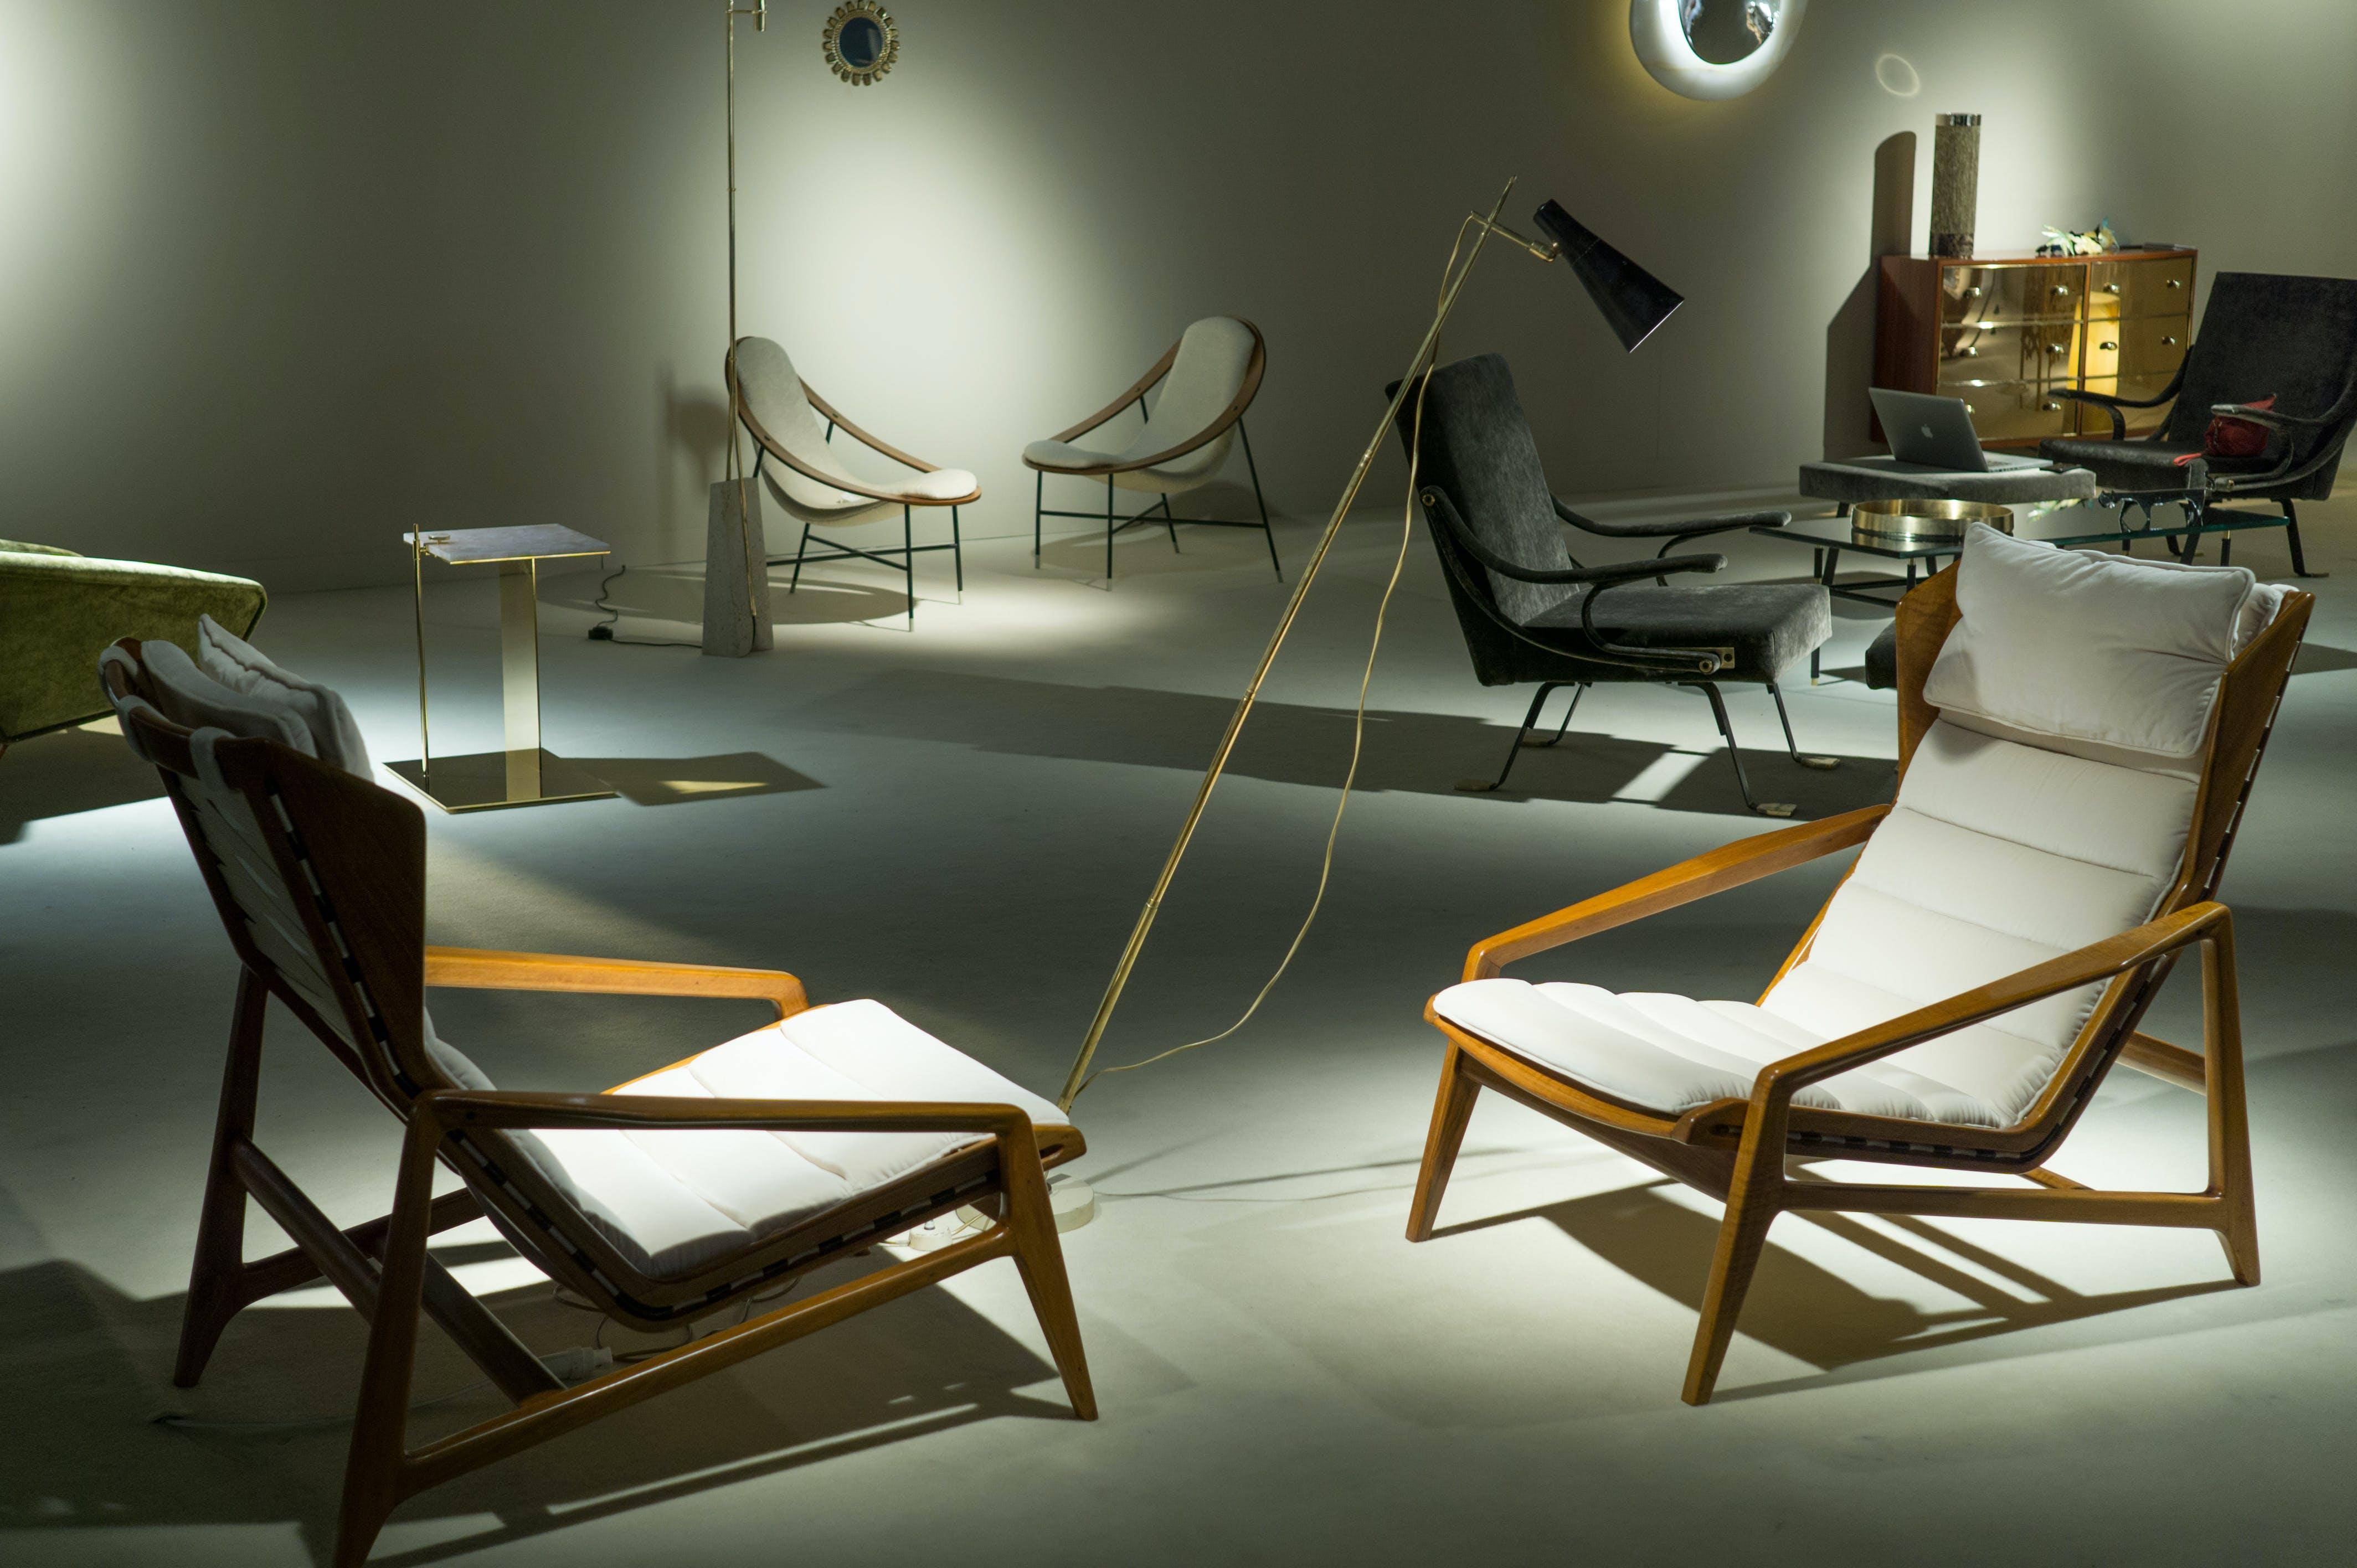 architecture, art, chair